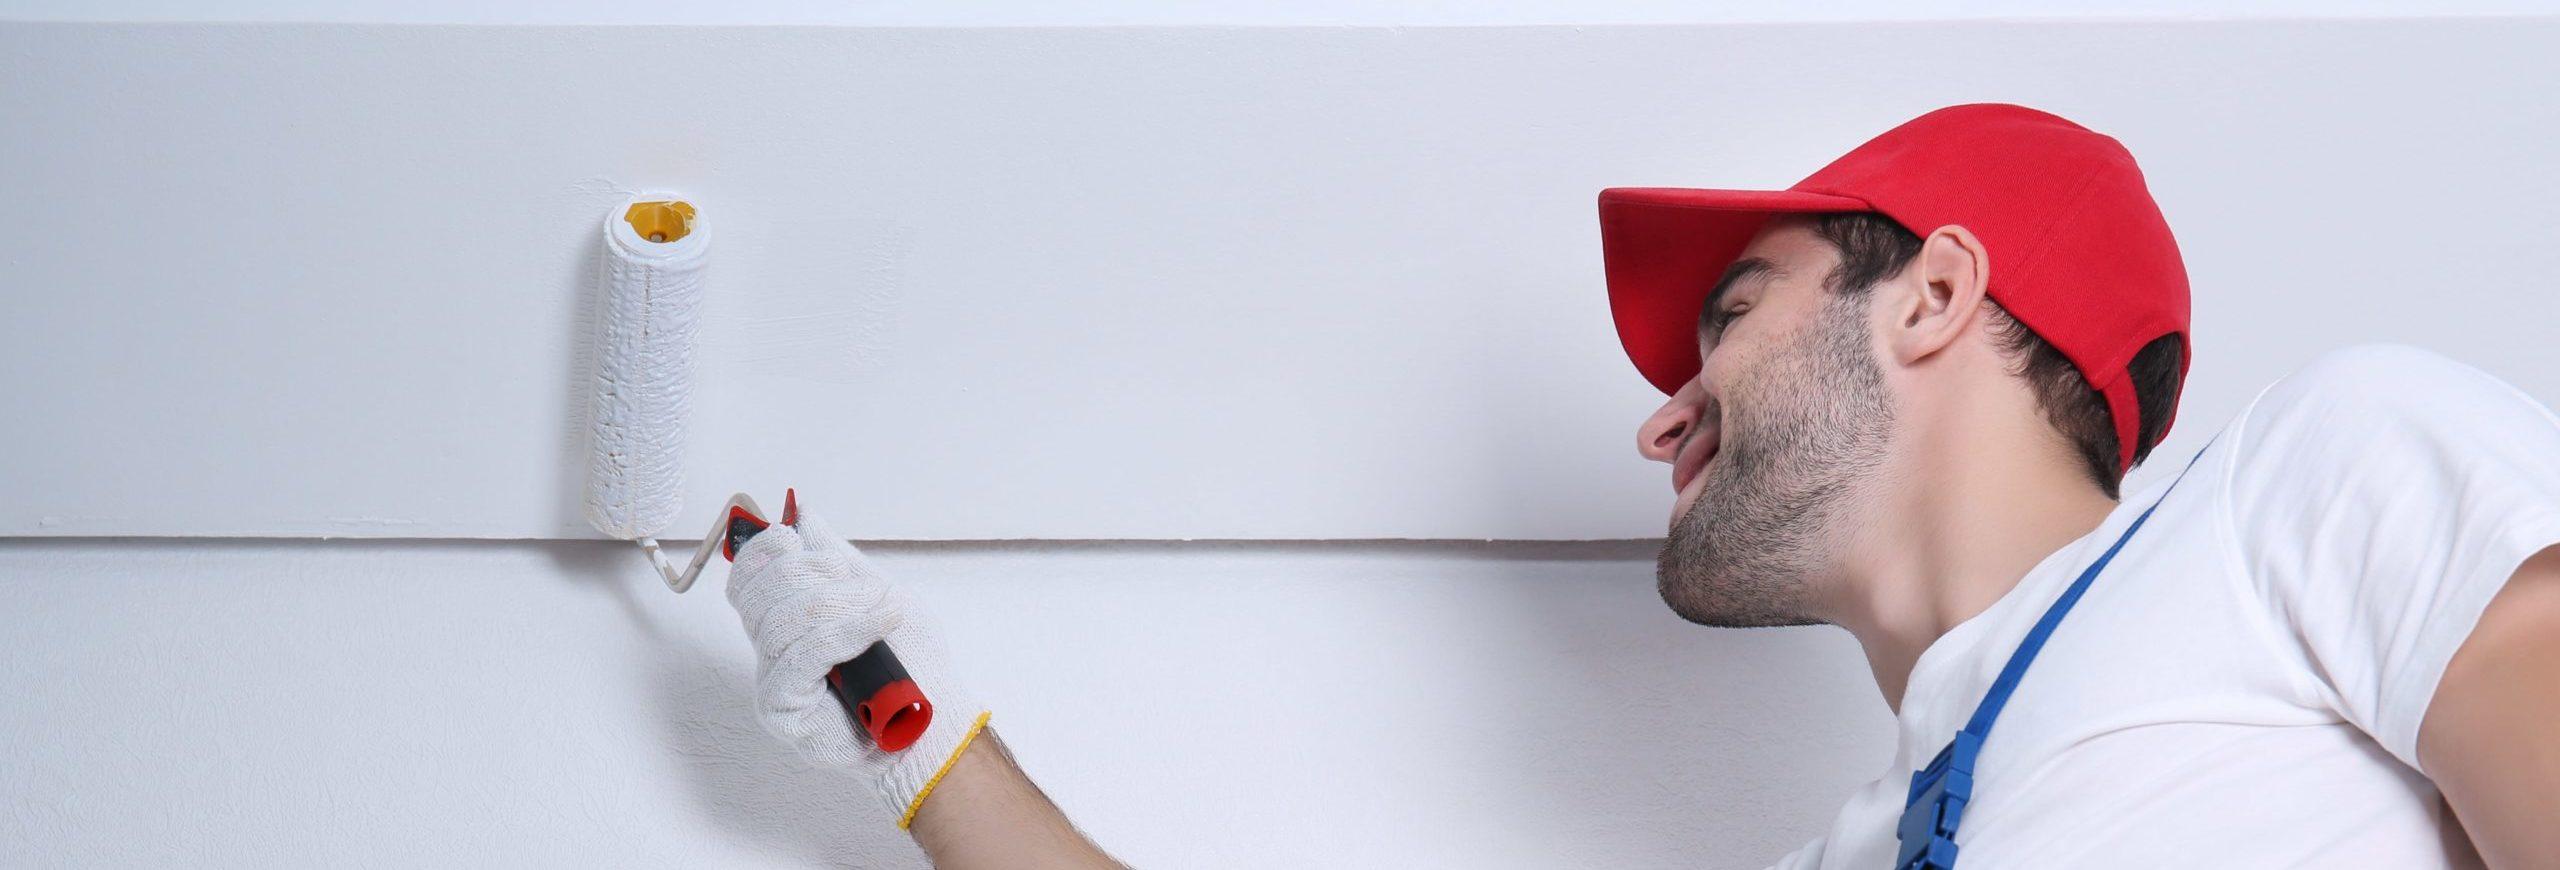 Краска для потолка в квартире